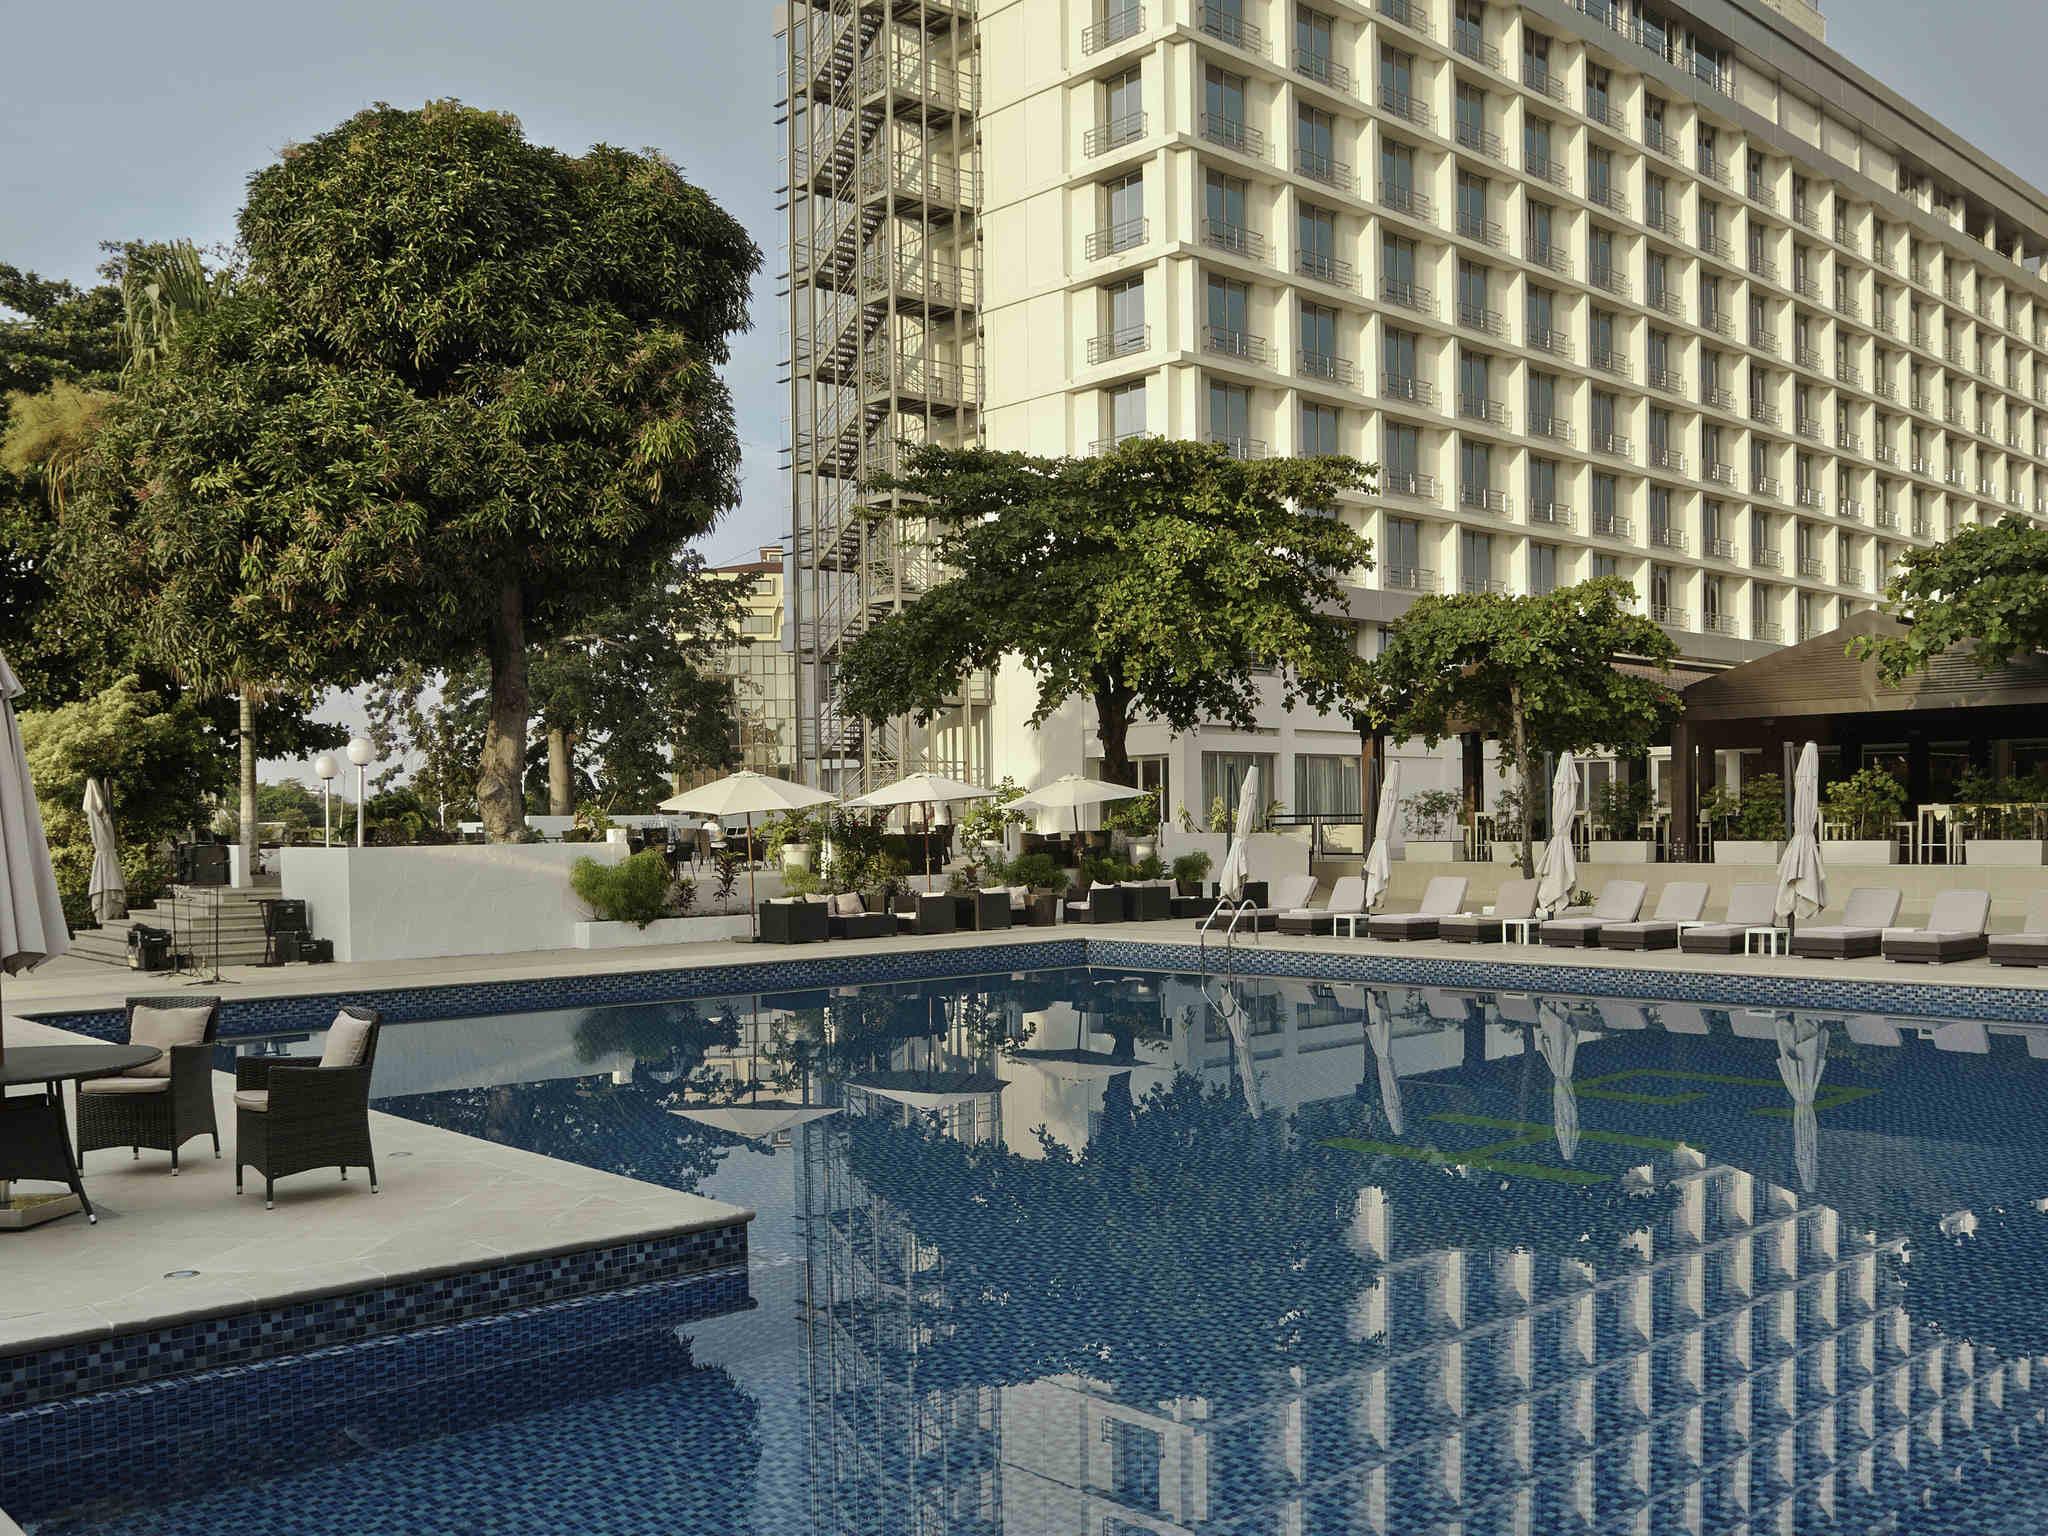 Hotel in kinshasa pullman kinshasa grand hotel for Pullman hotel